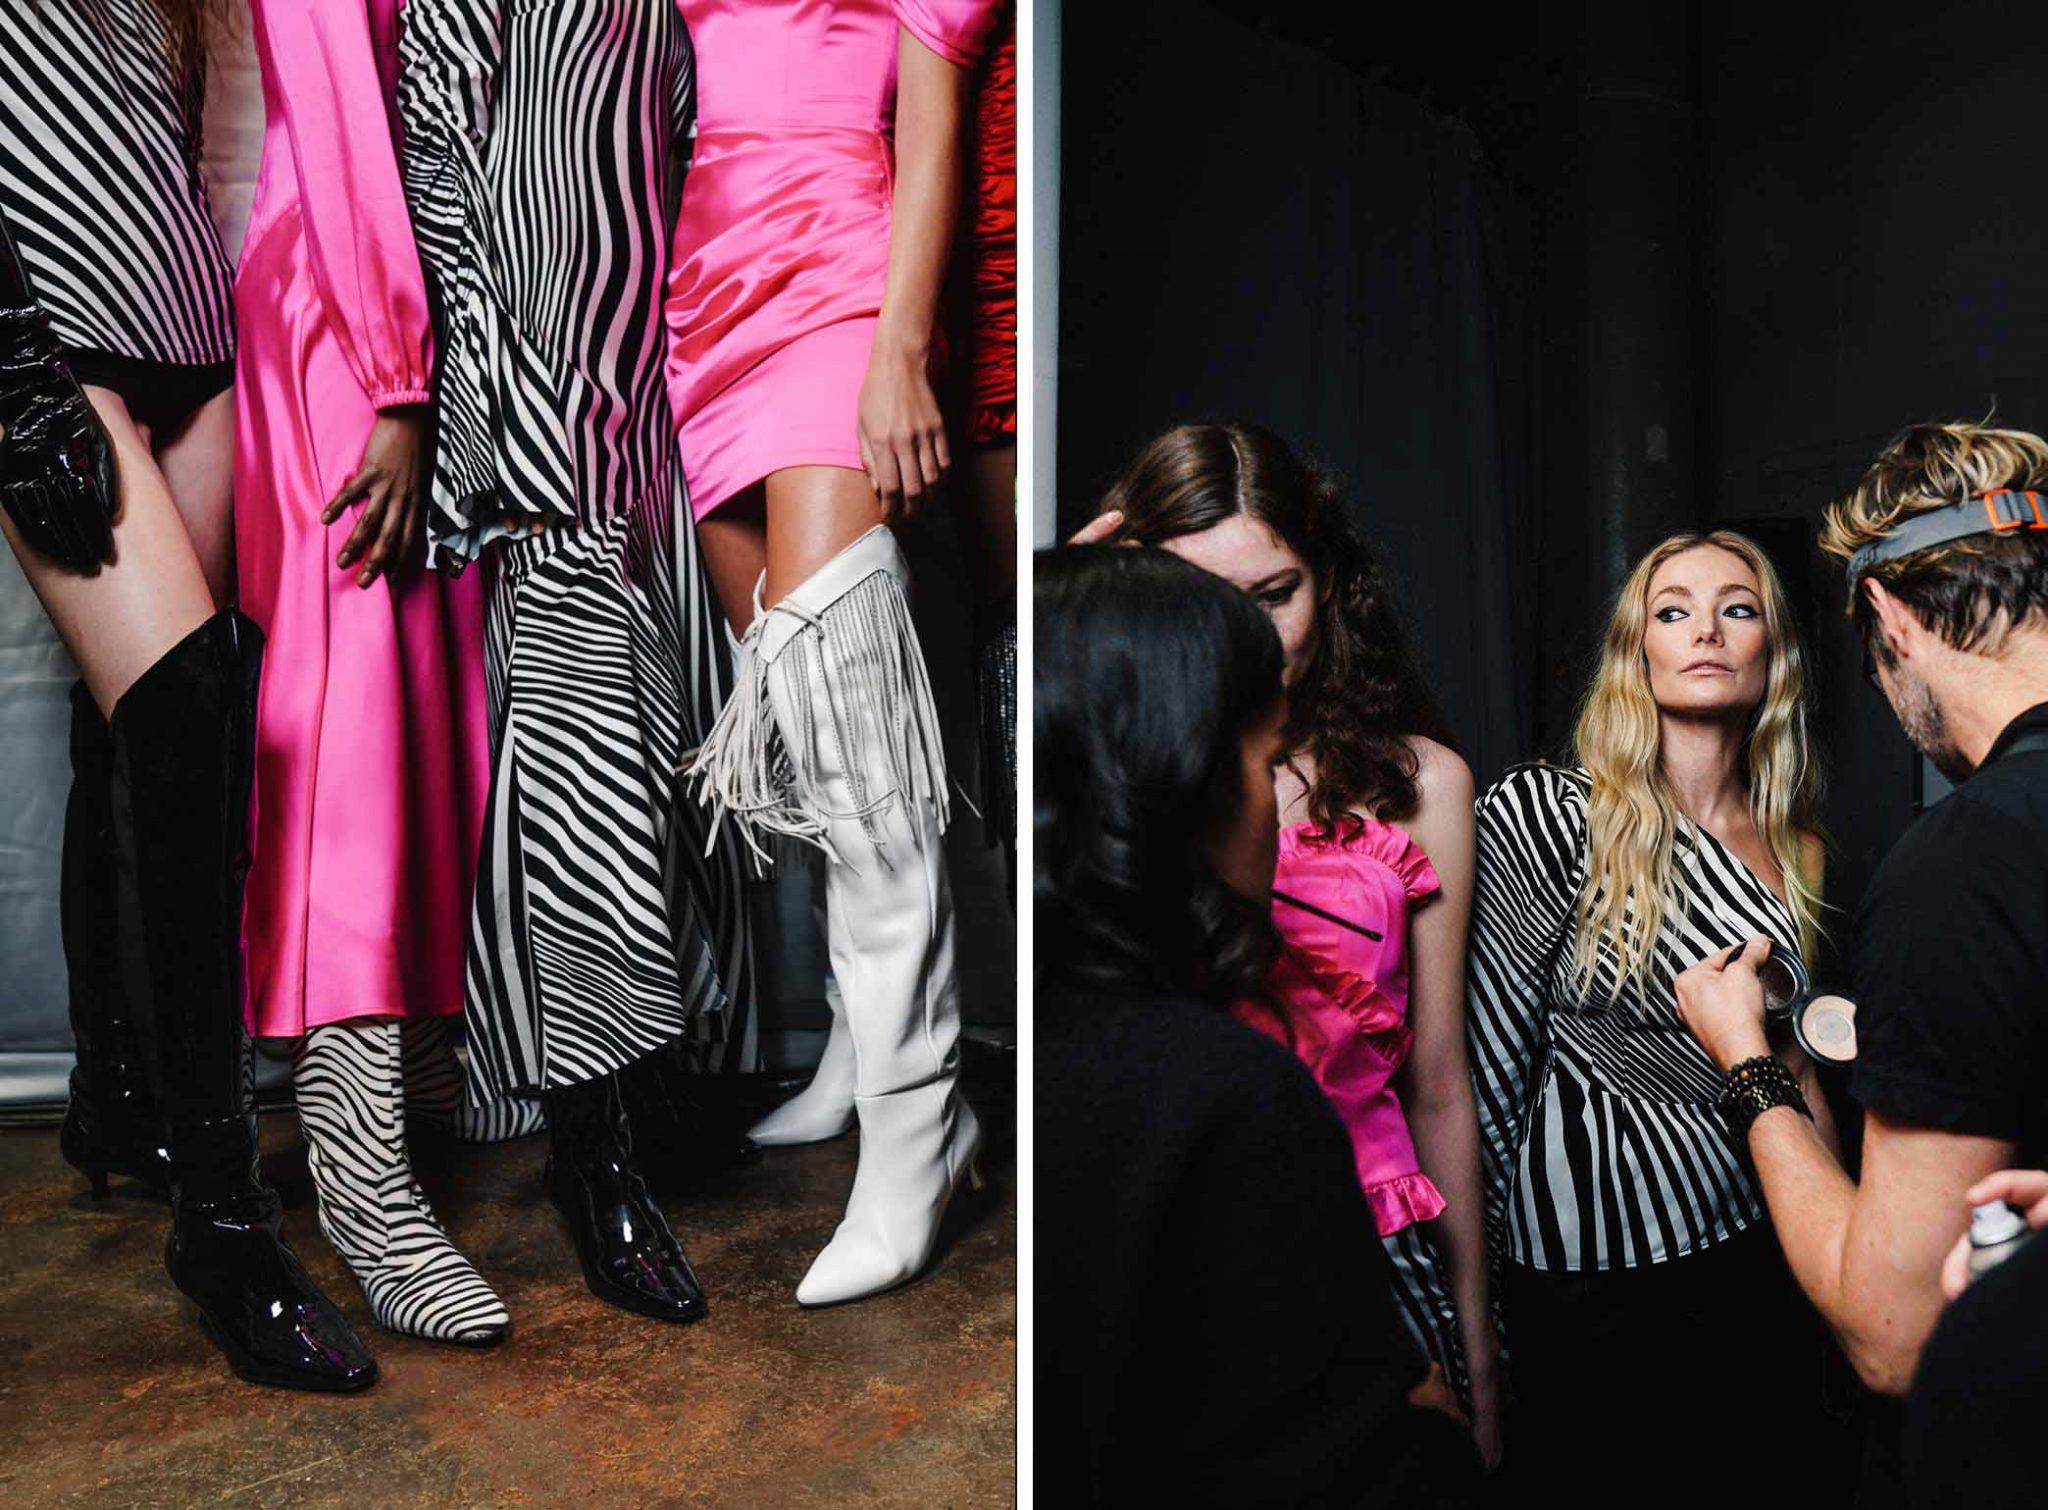 Ilsoo_van_Dijk_Ilsoovandijk_AFW_Toral_Backstage_Amsterdam_Fashion_week_2020_-scaled_18